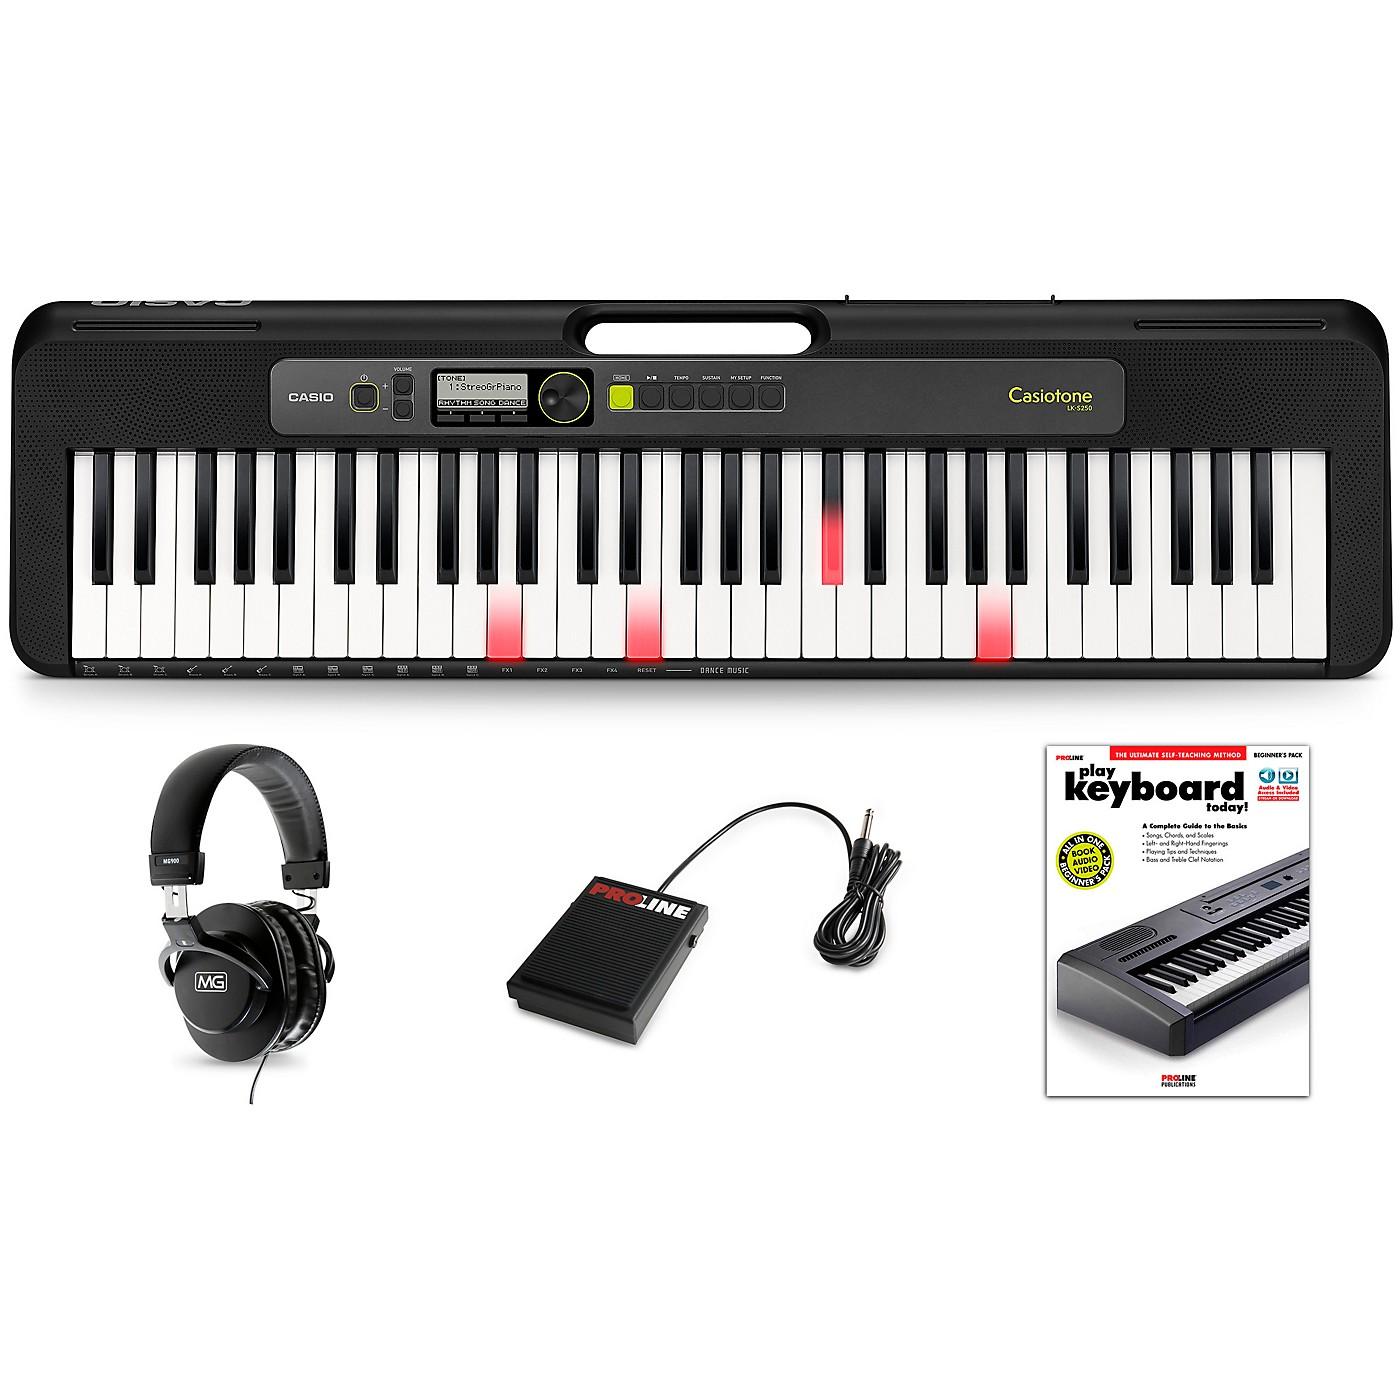 Casio Casiotone LK-S250 Keyboard Essentials Kit thumbnail